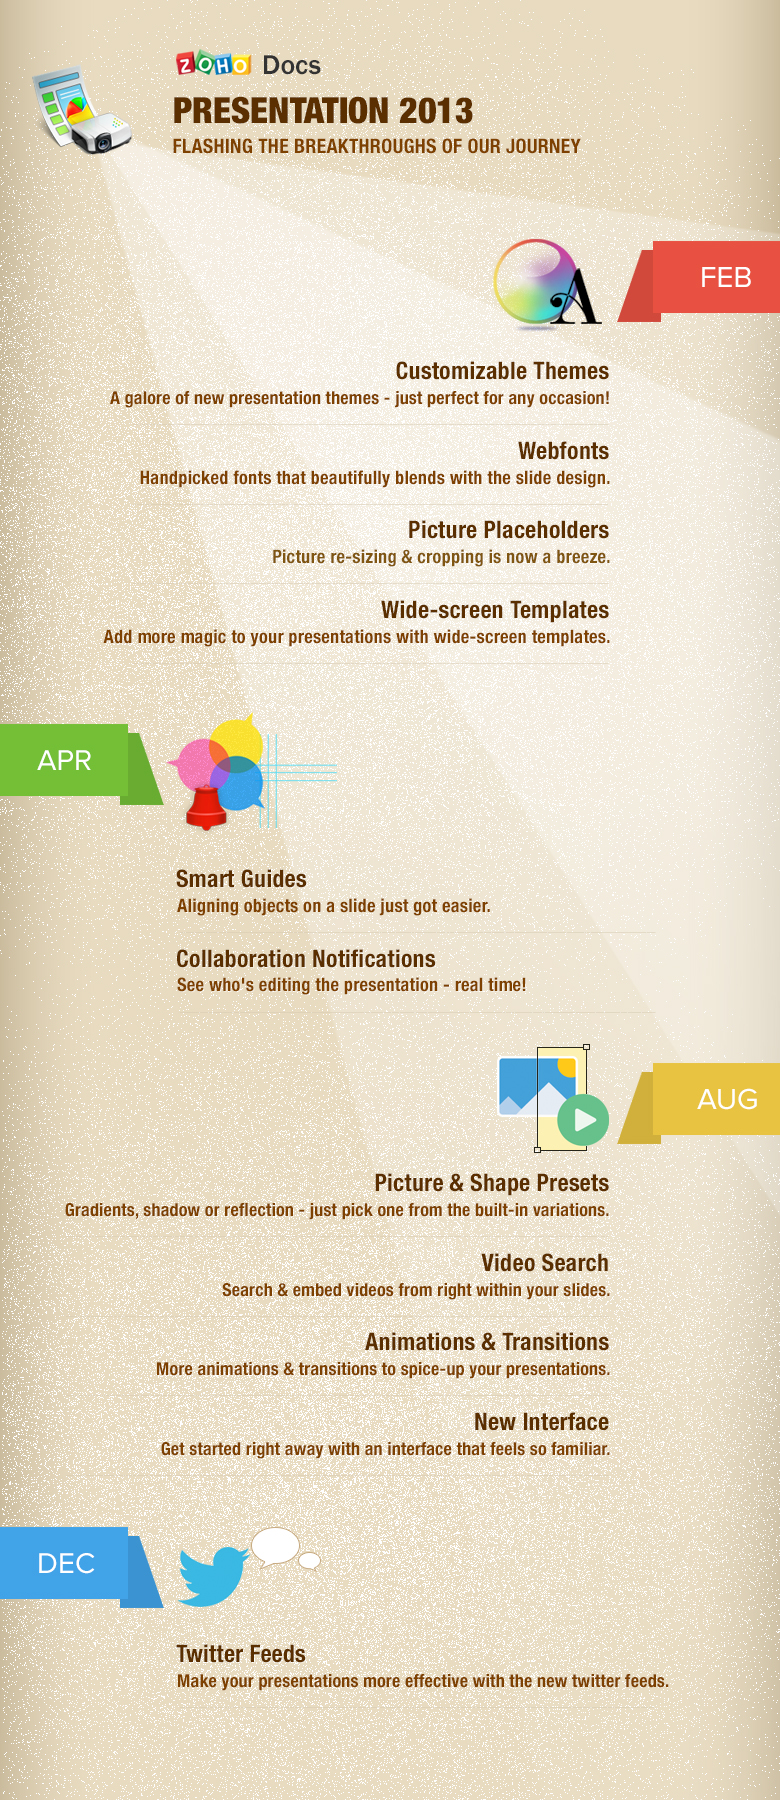 zoho docs presentation infographic